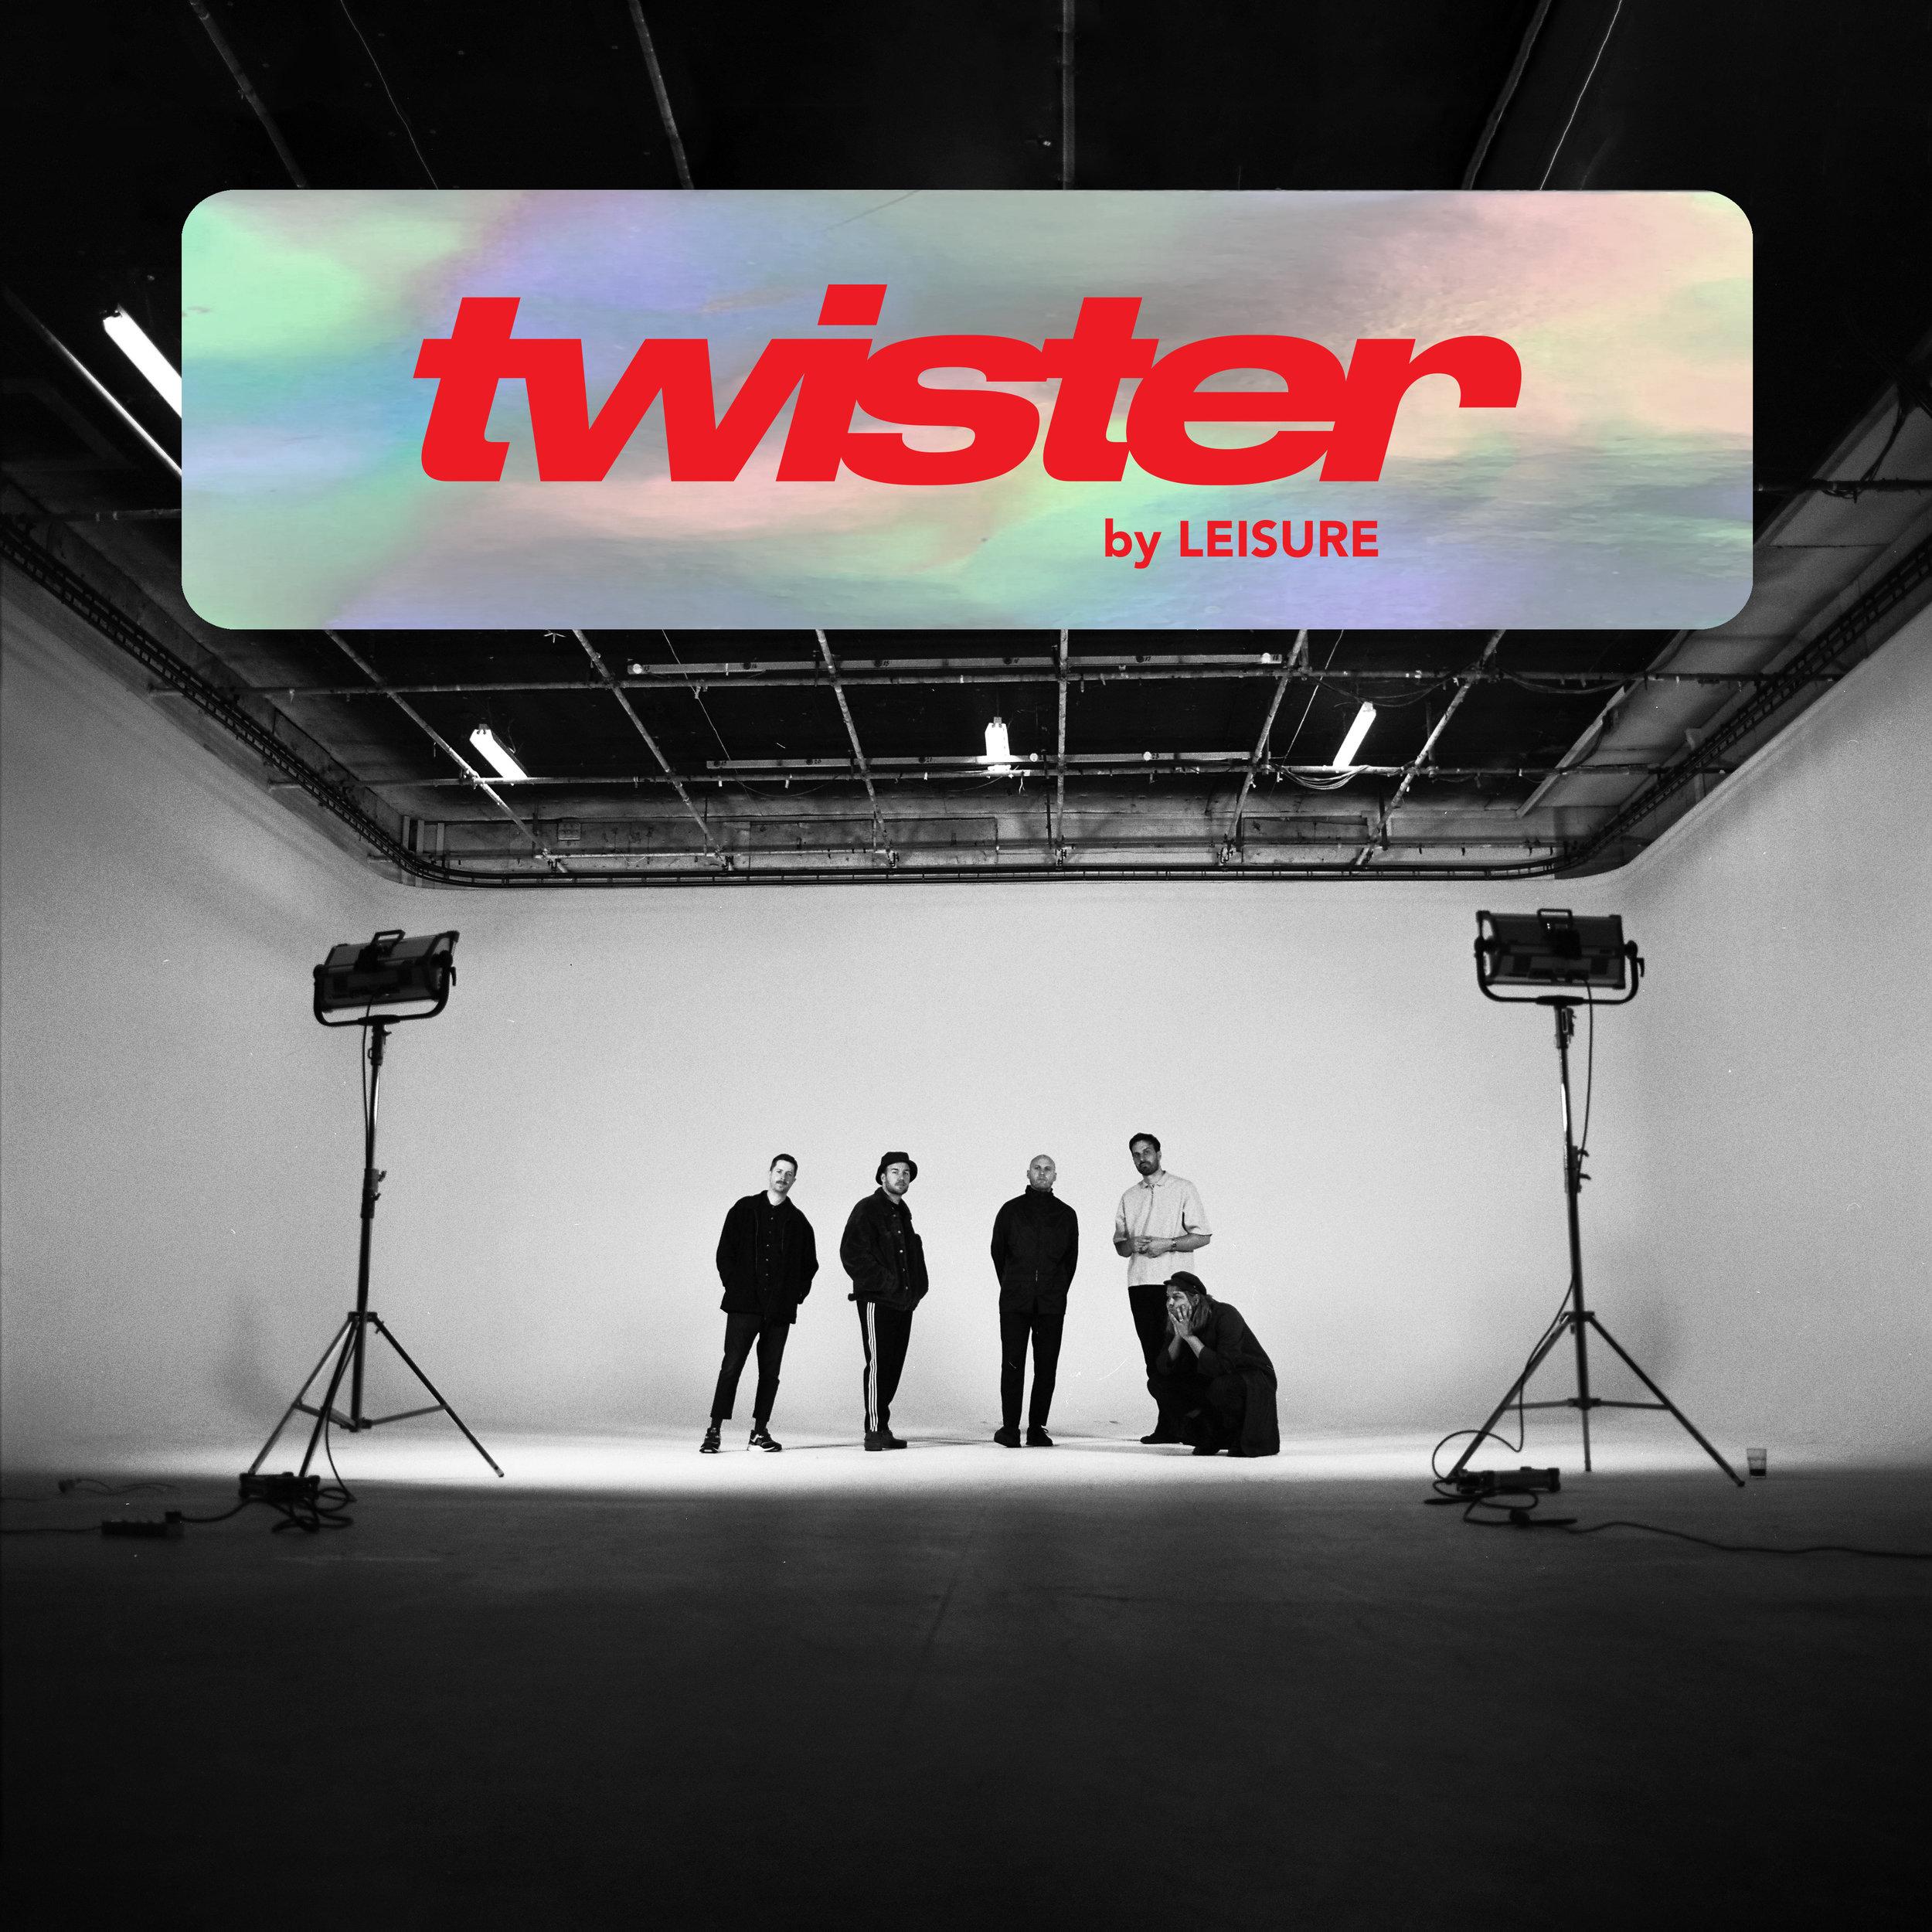 LEISURE_TWISTER_ALBUM_FRONT_digital.jpg